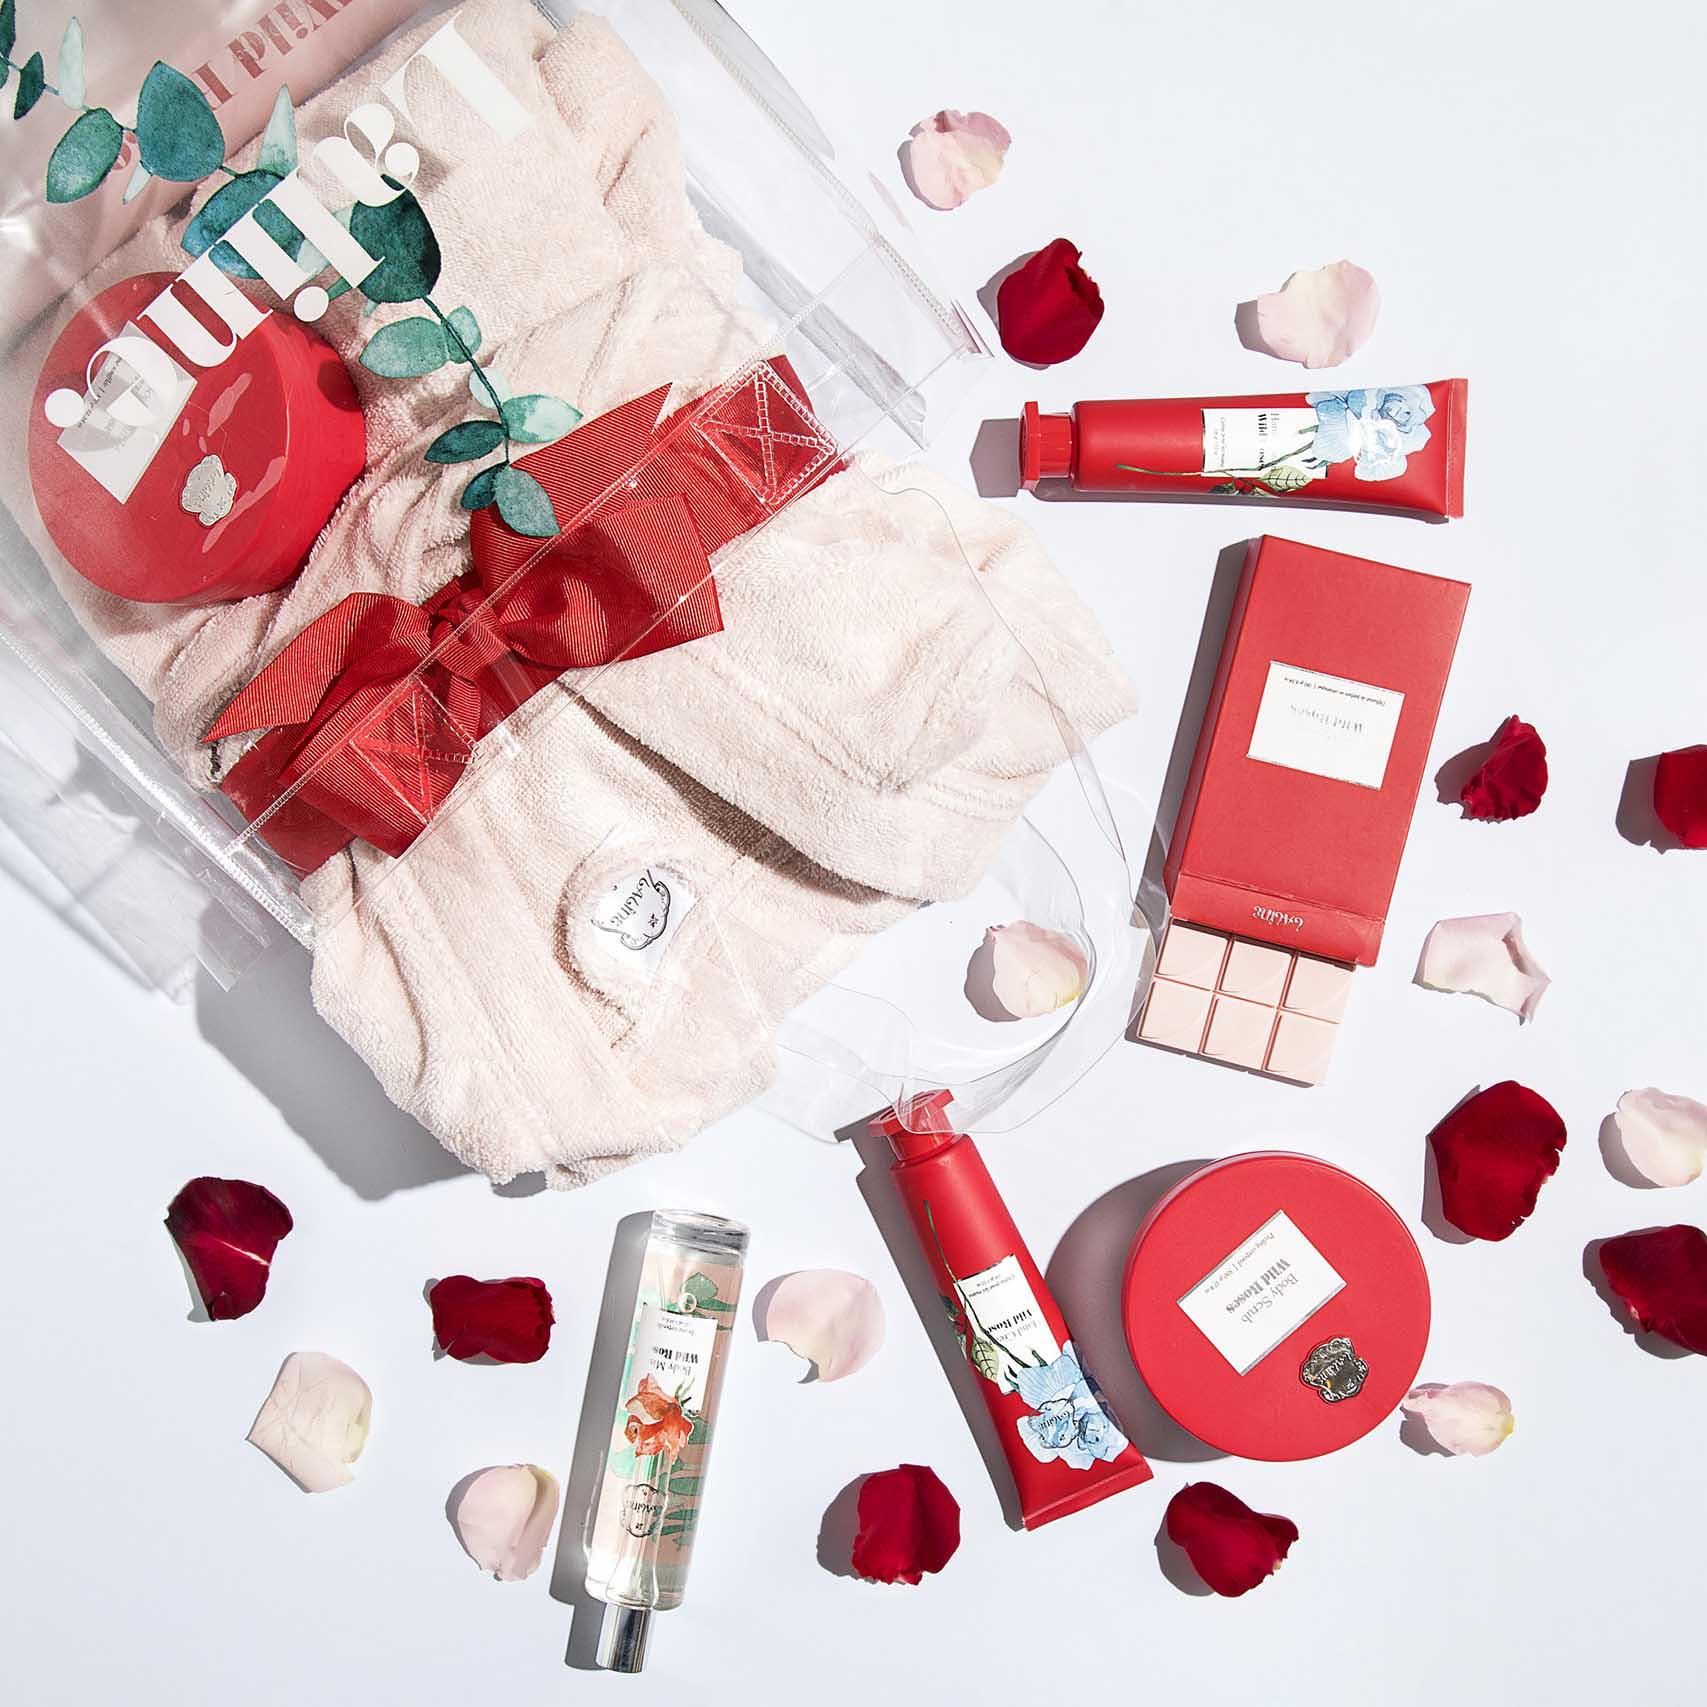 Valentine's Day 2020, ללין קולקציית WILD ROSES צילום תמוז רחמן-טיפוח העור